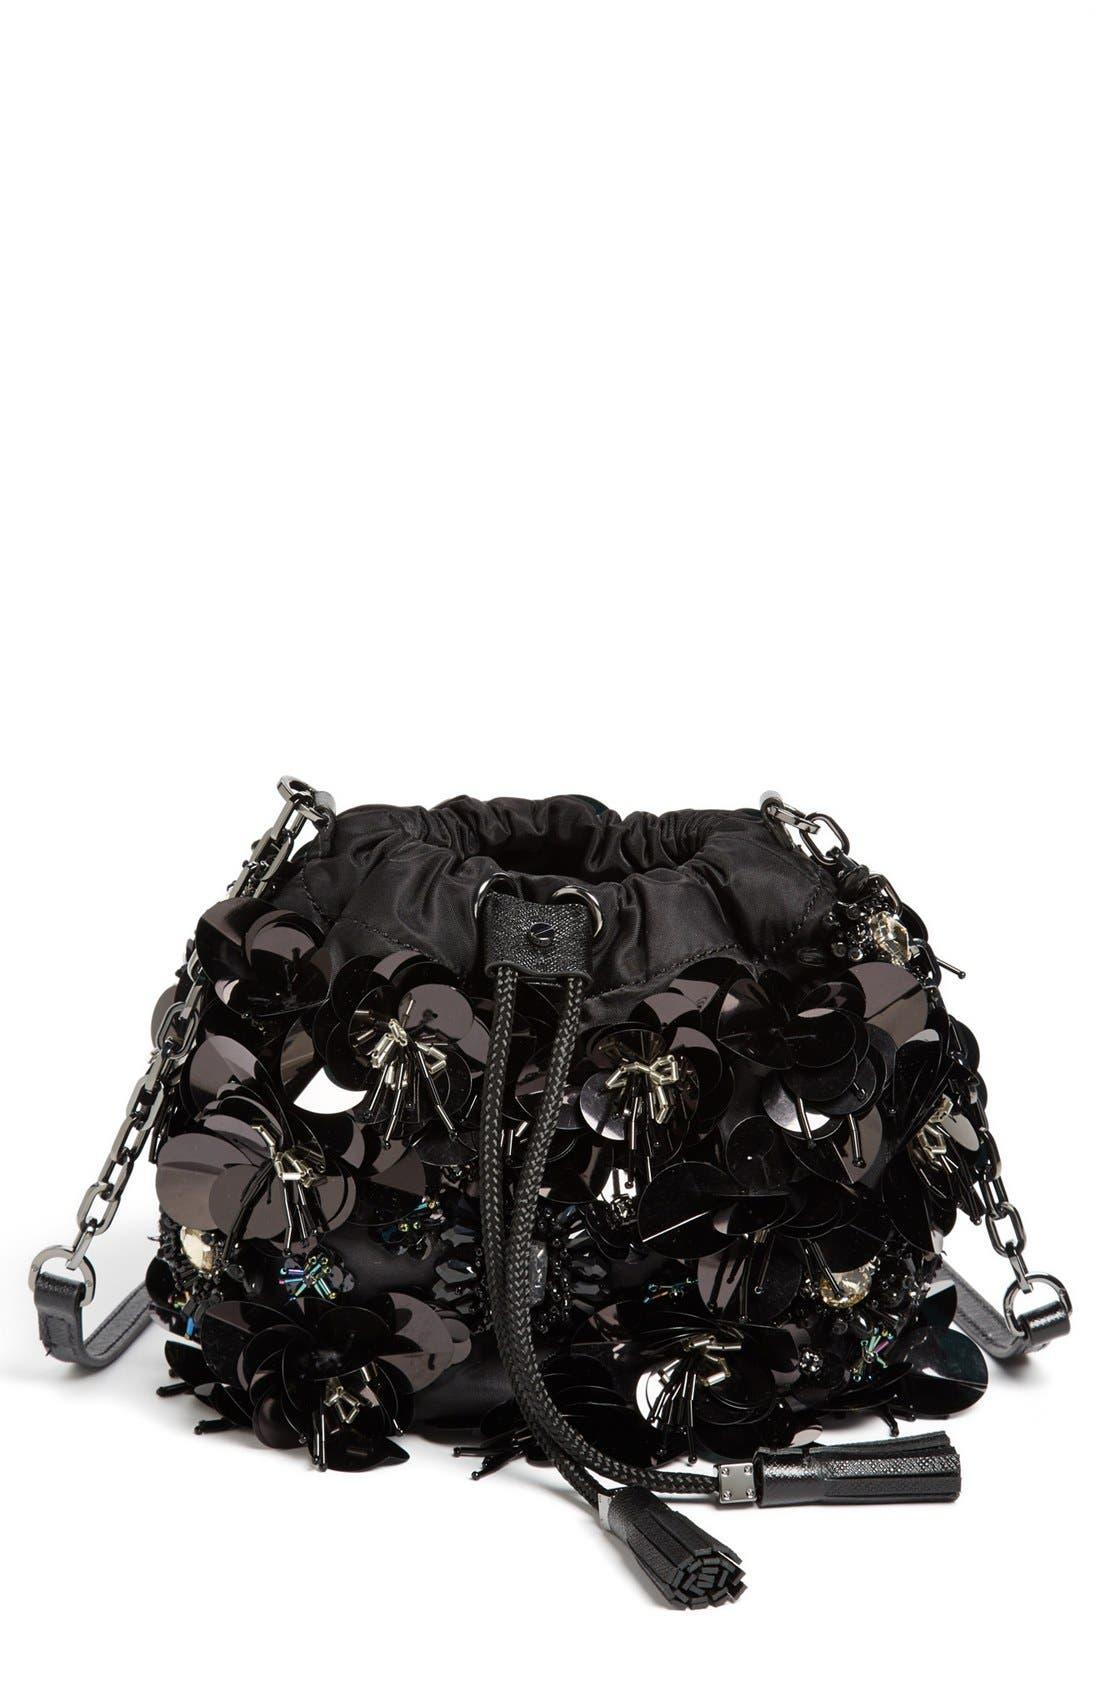 Alternate Image 1 Selected - Tory Burch 'Flower Cluster - Mini' Crossbody Bag